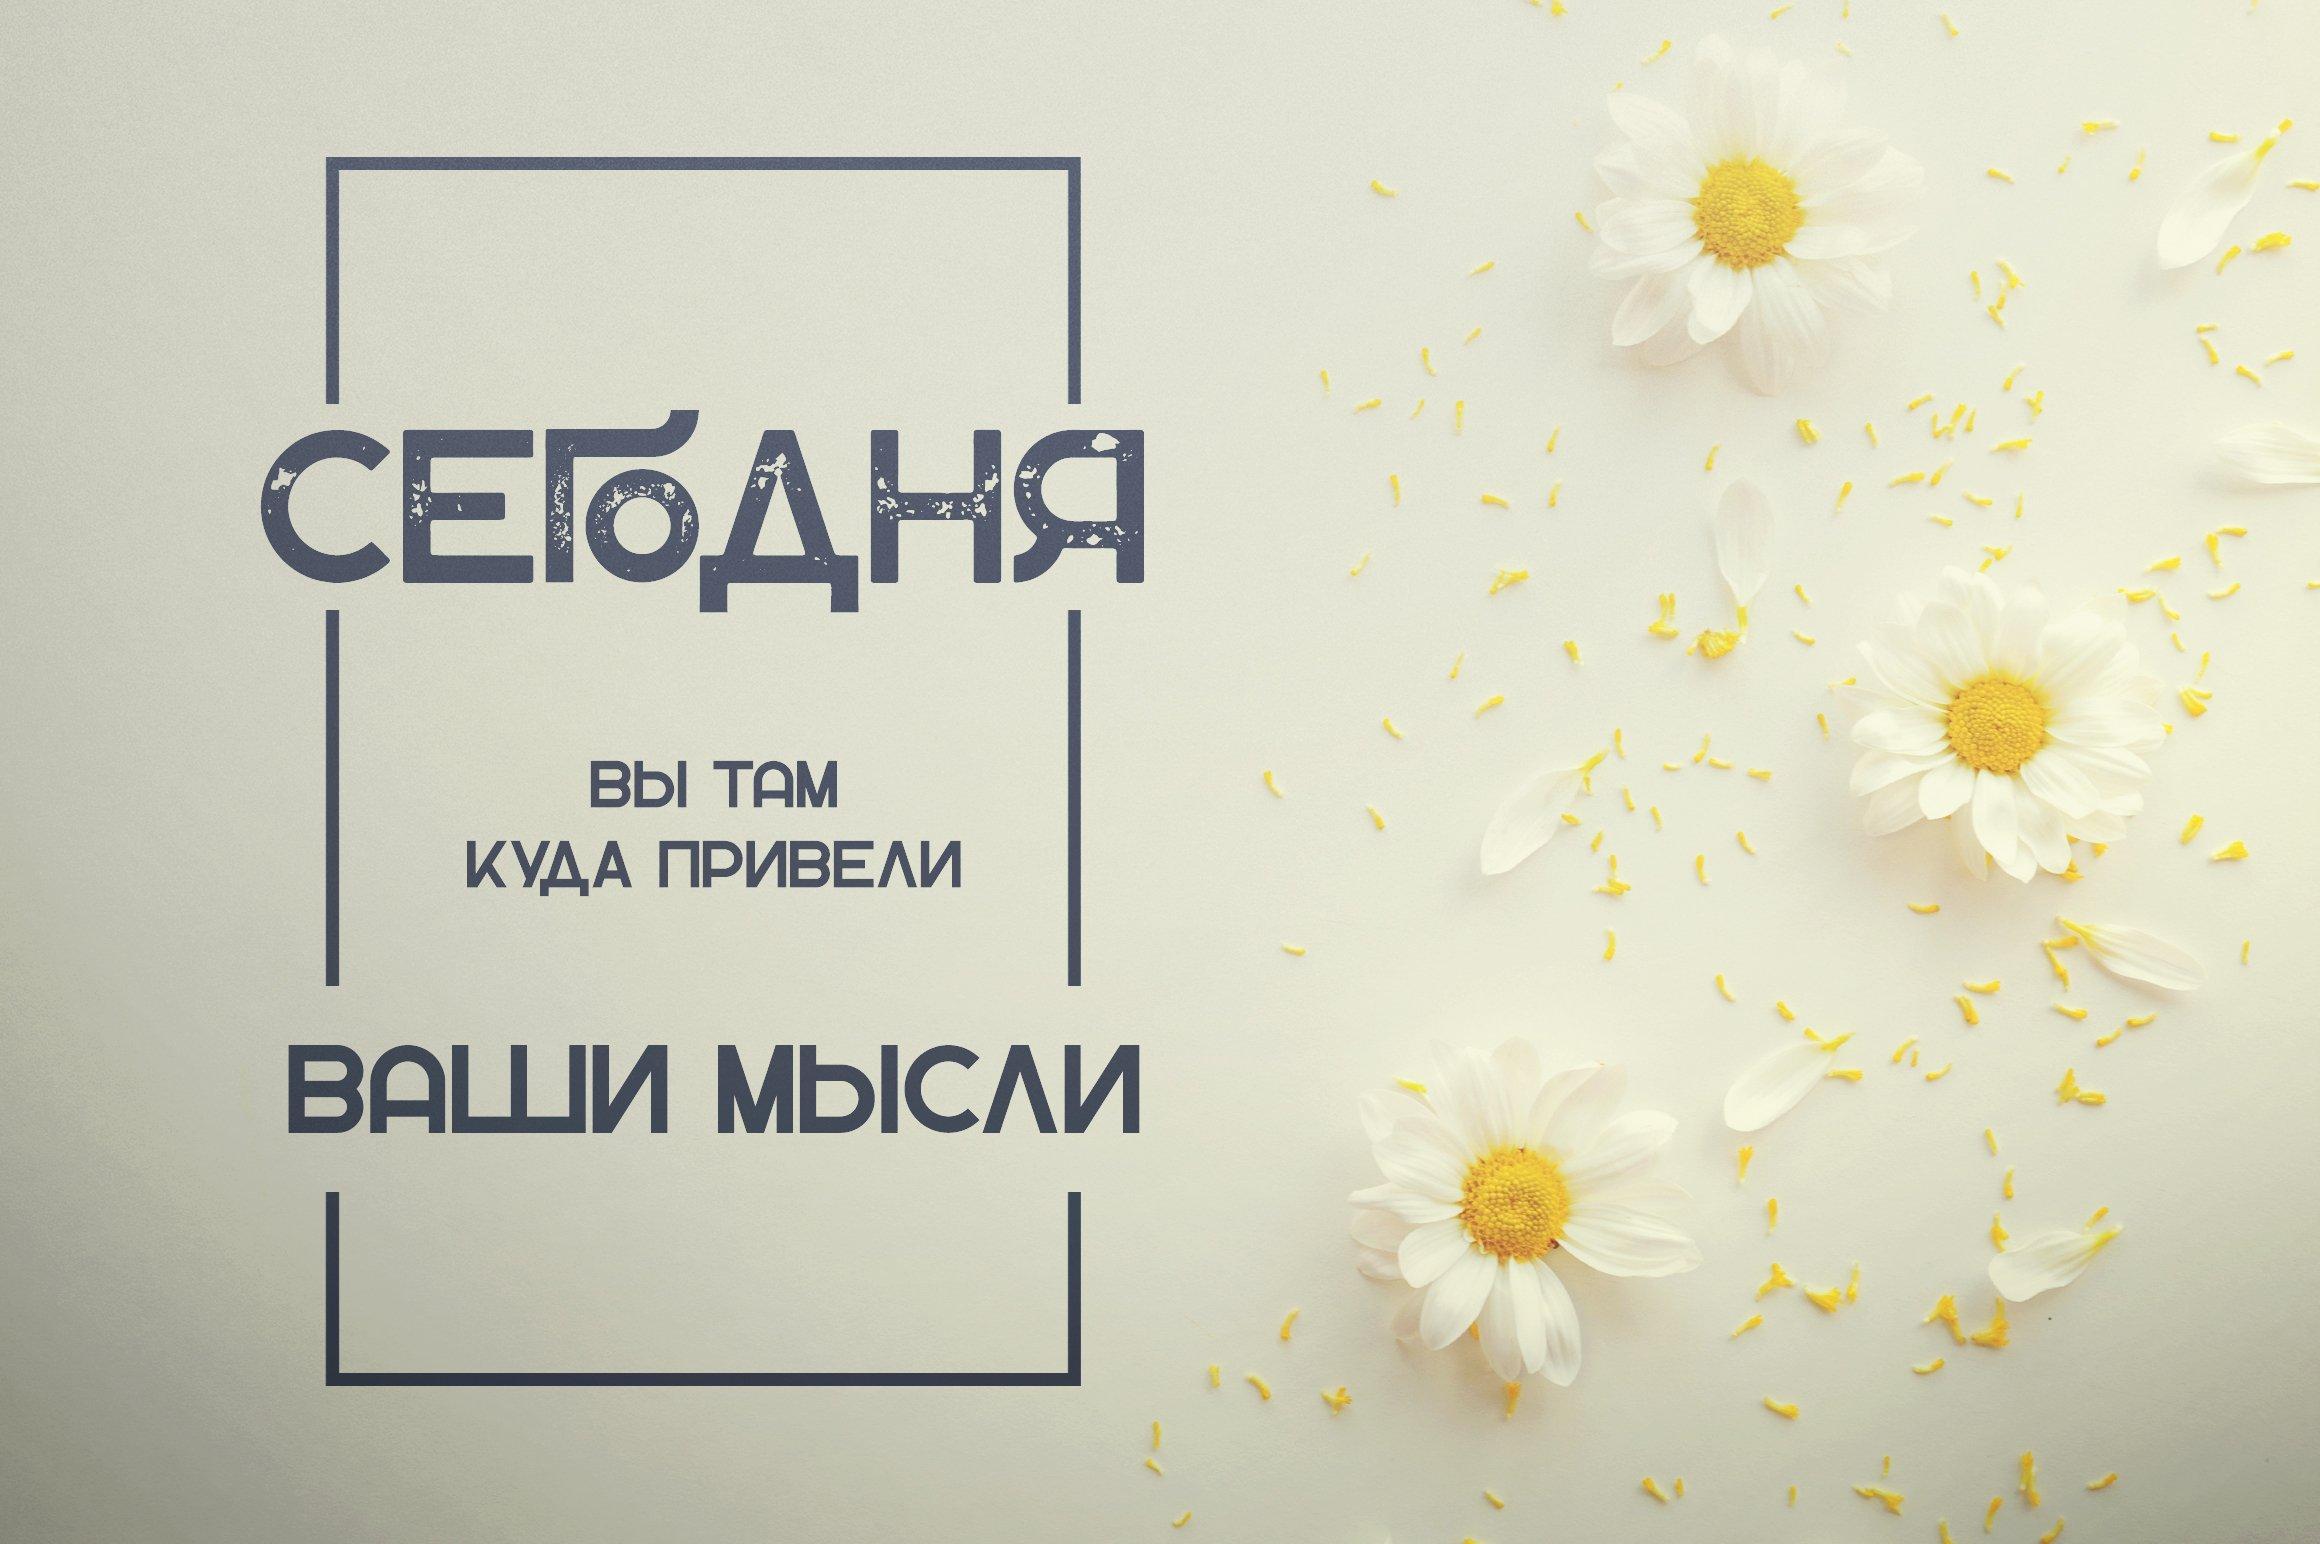 Greenth Display | Latin & Cyrillic example image 7